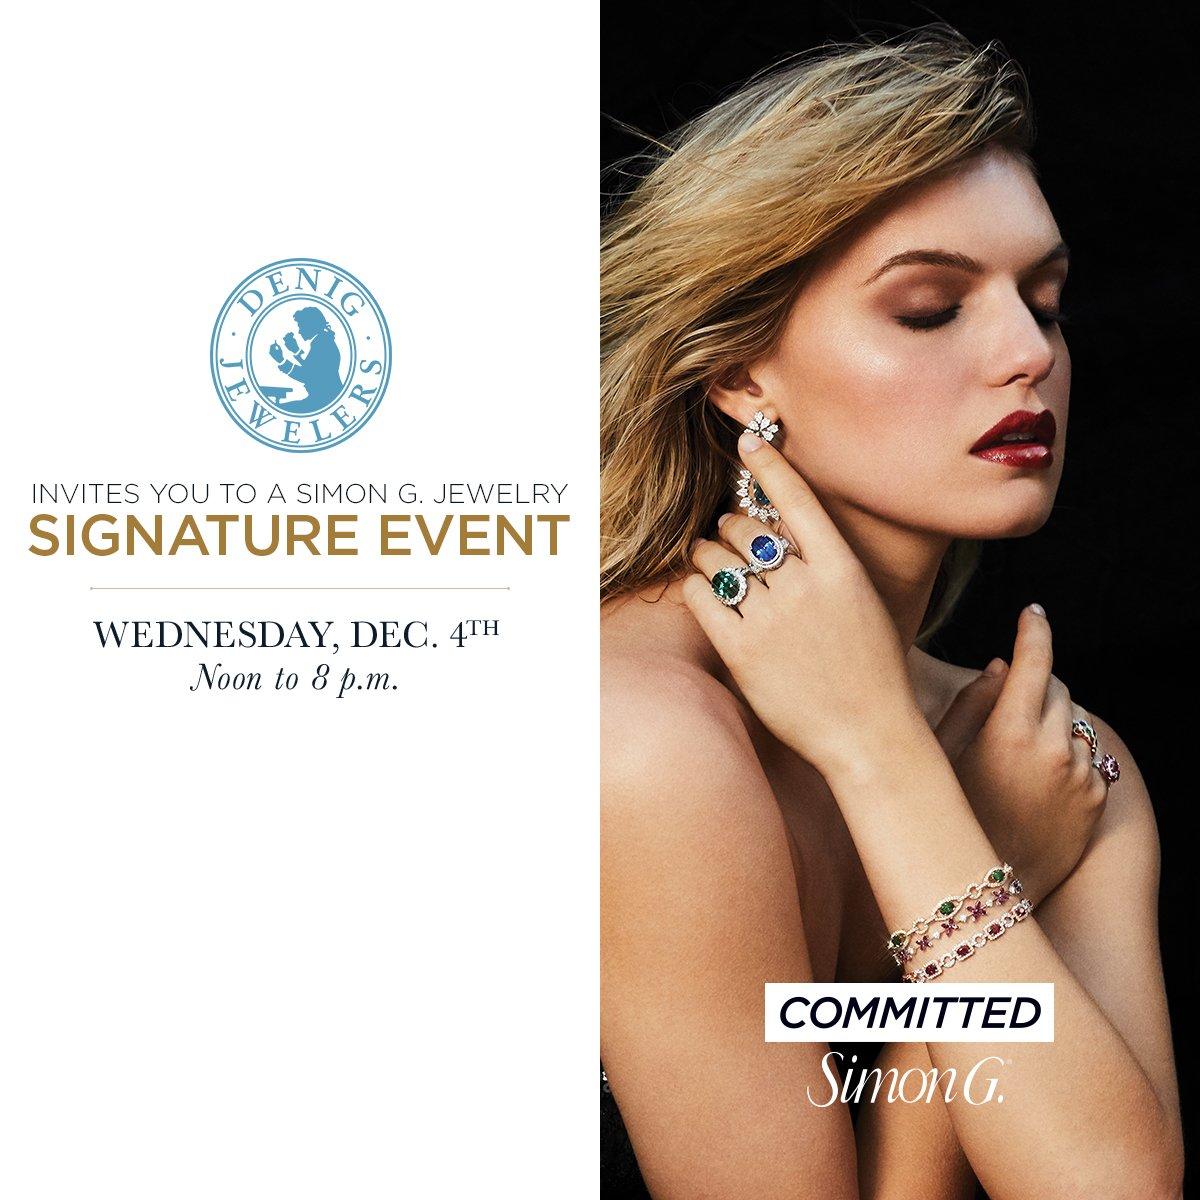 Event at Denig Jewelers